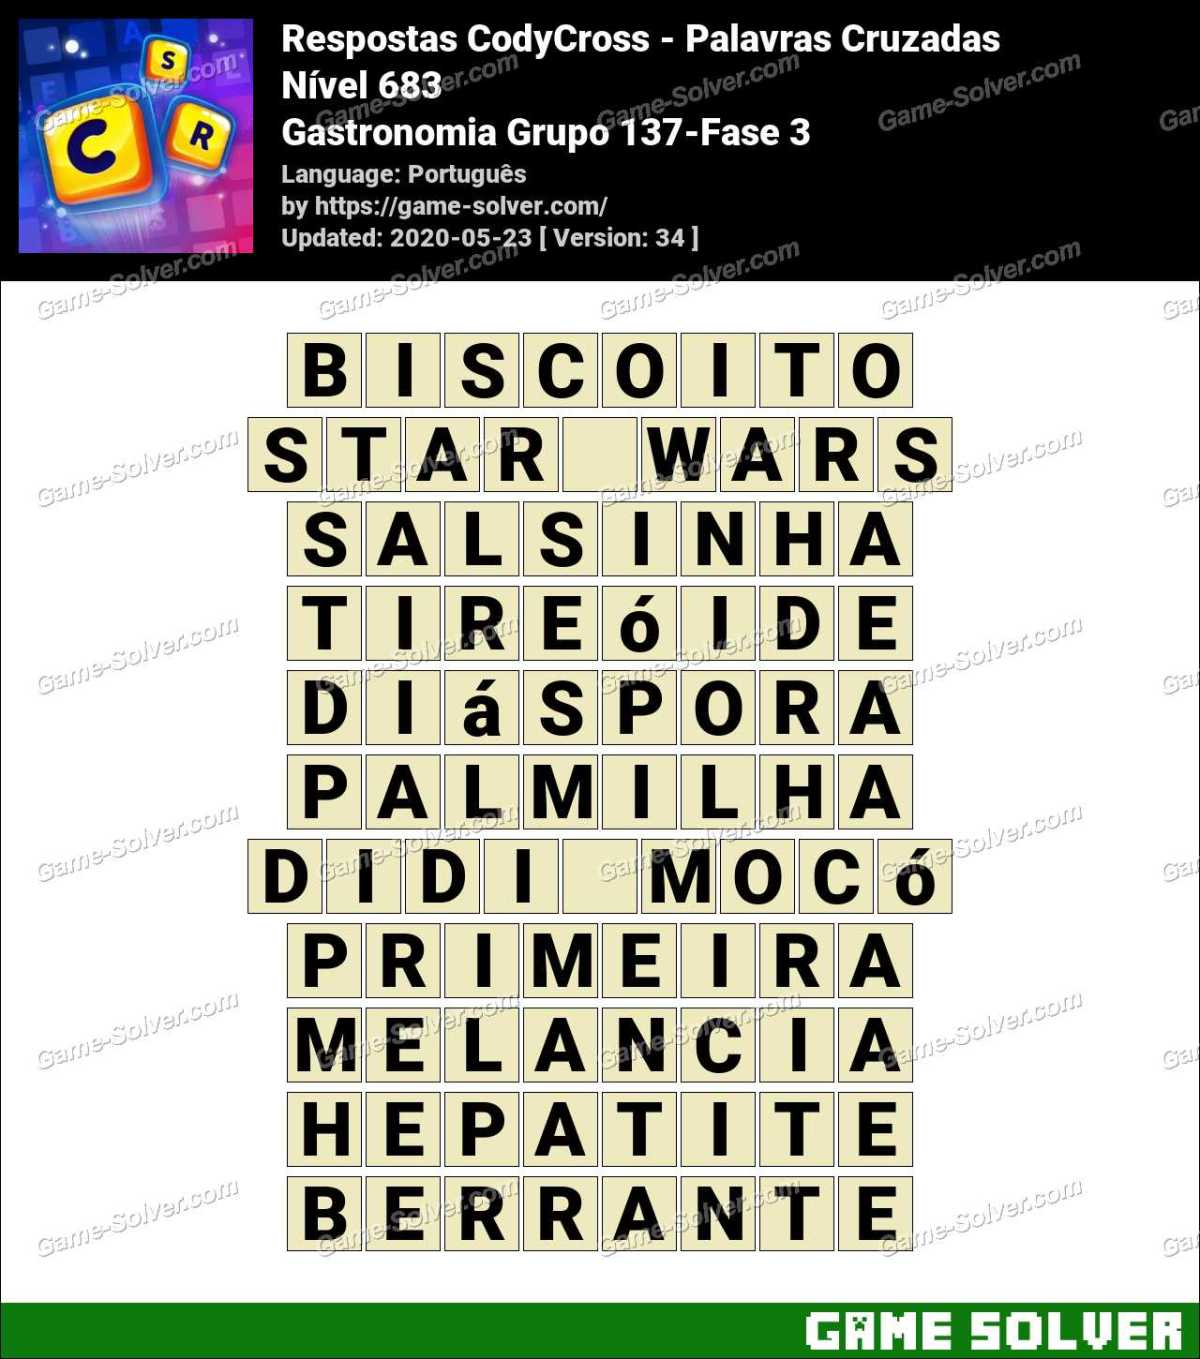 Respostas CodyCross Gastronomia Grupo 137-Fase 3